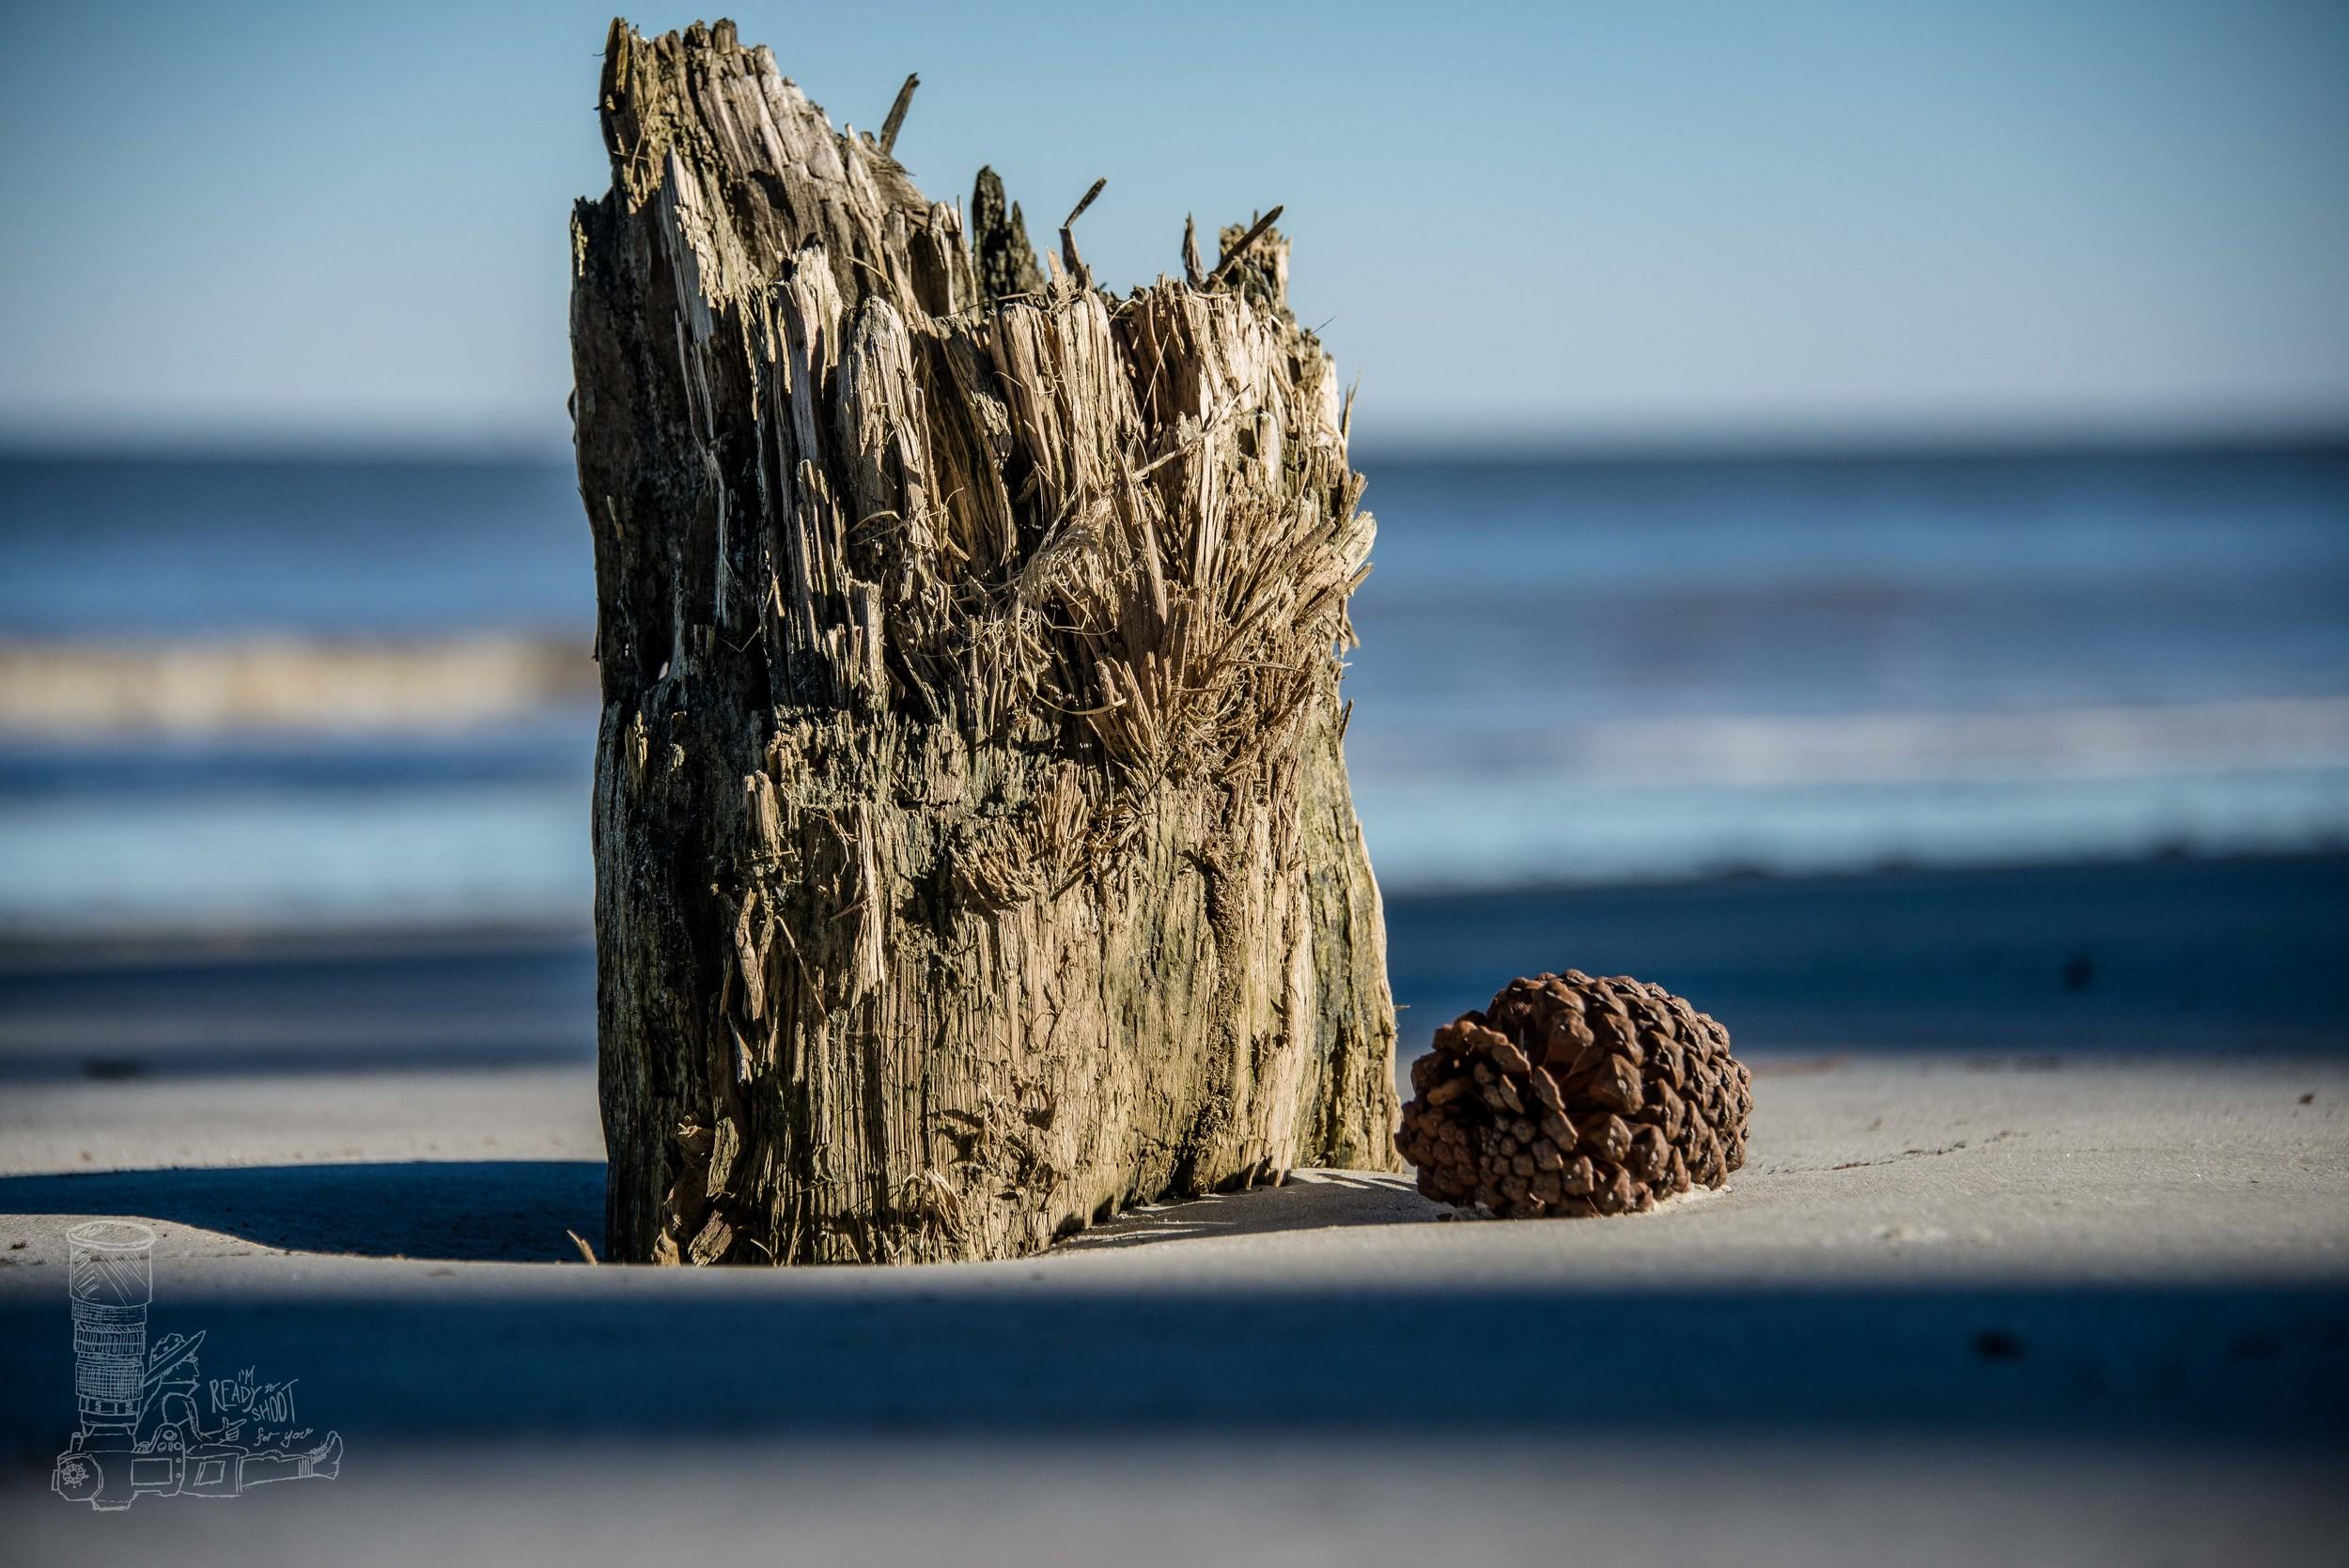 Still Life on Driftwood Beach